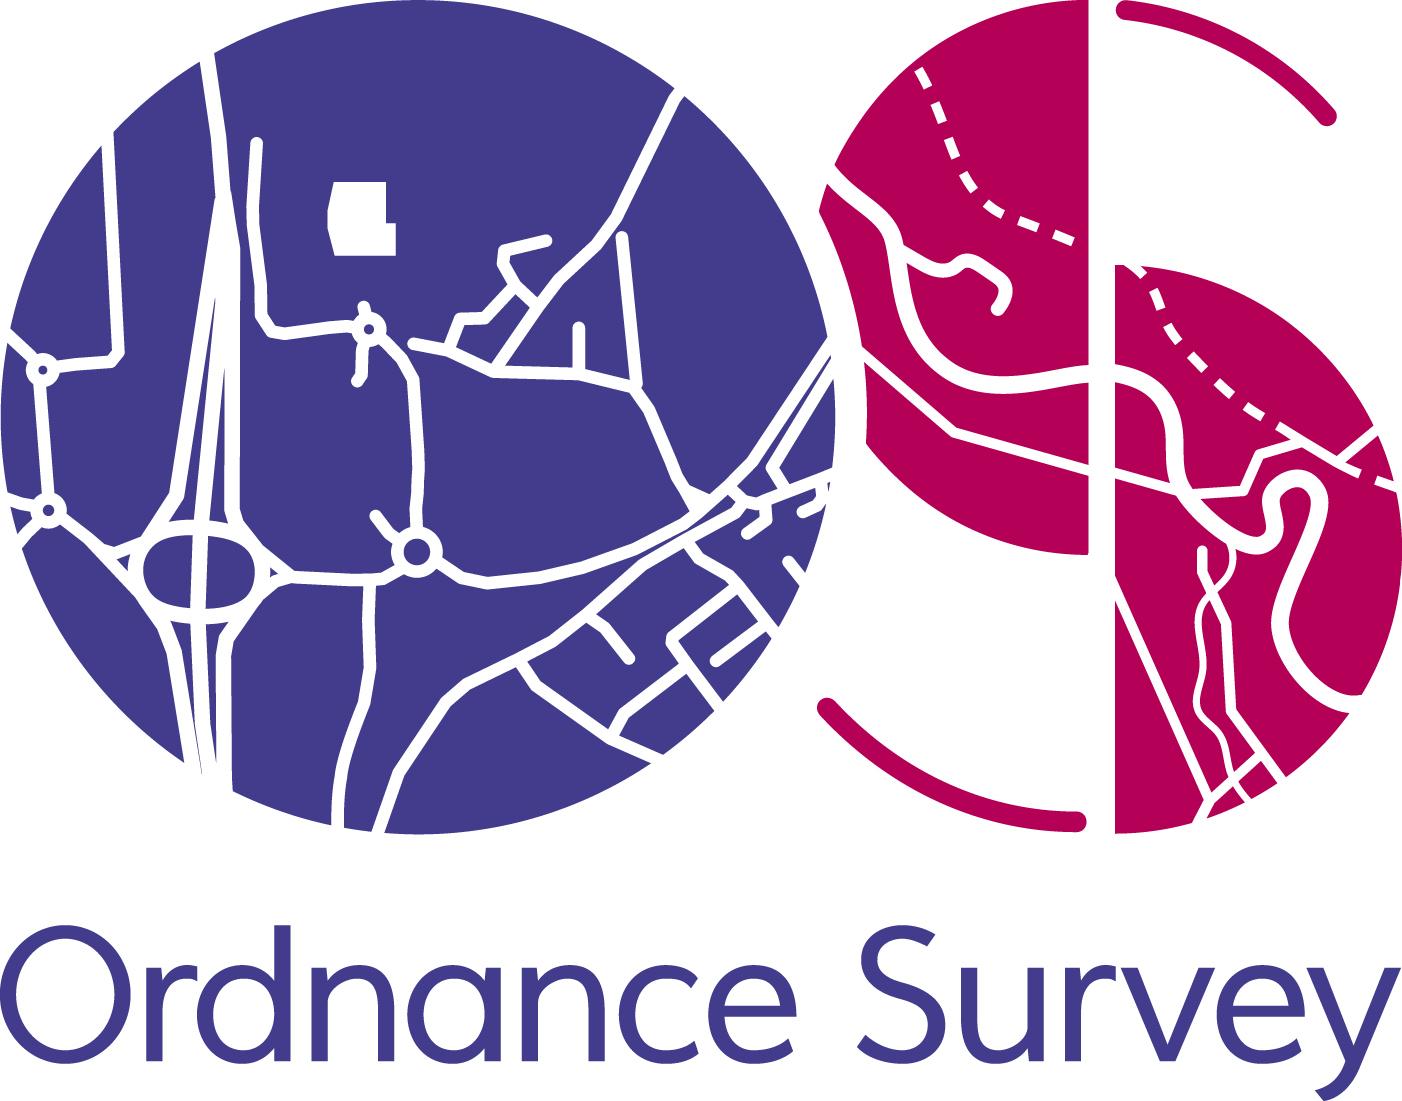 Free Ordnance Survey Maps Os Explorer And Os Landranger Via Bing